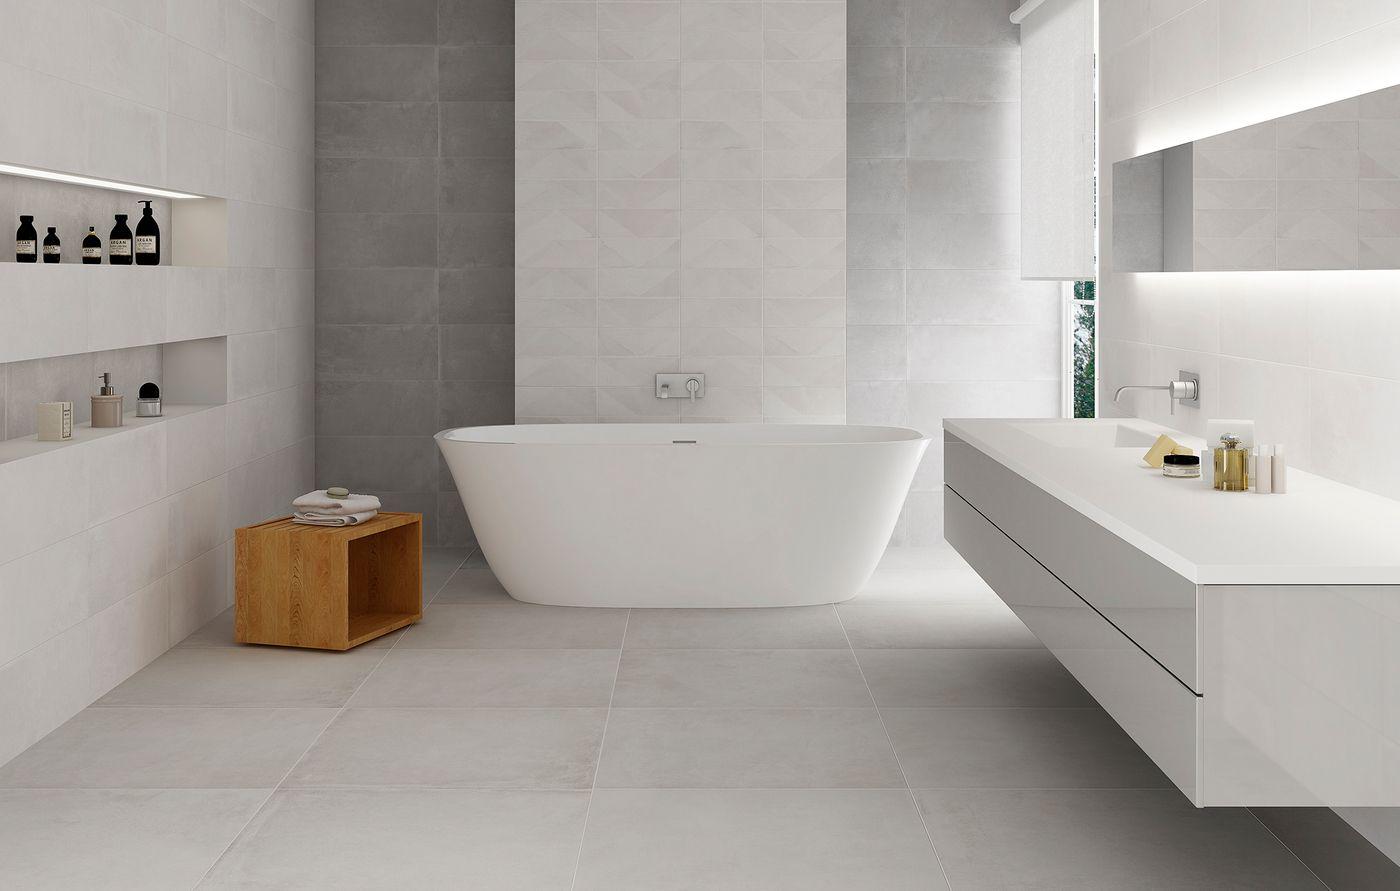 Carrelage Contemporain Design Blanc Nevada Blanco1 Carrelage Salle De Bain Salle De Bain Design Salle De Bain Grise